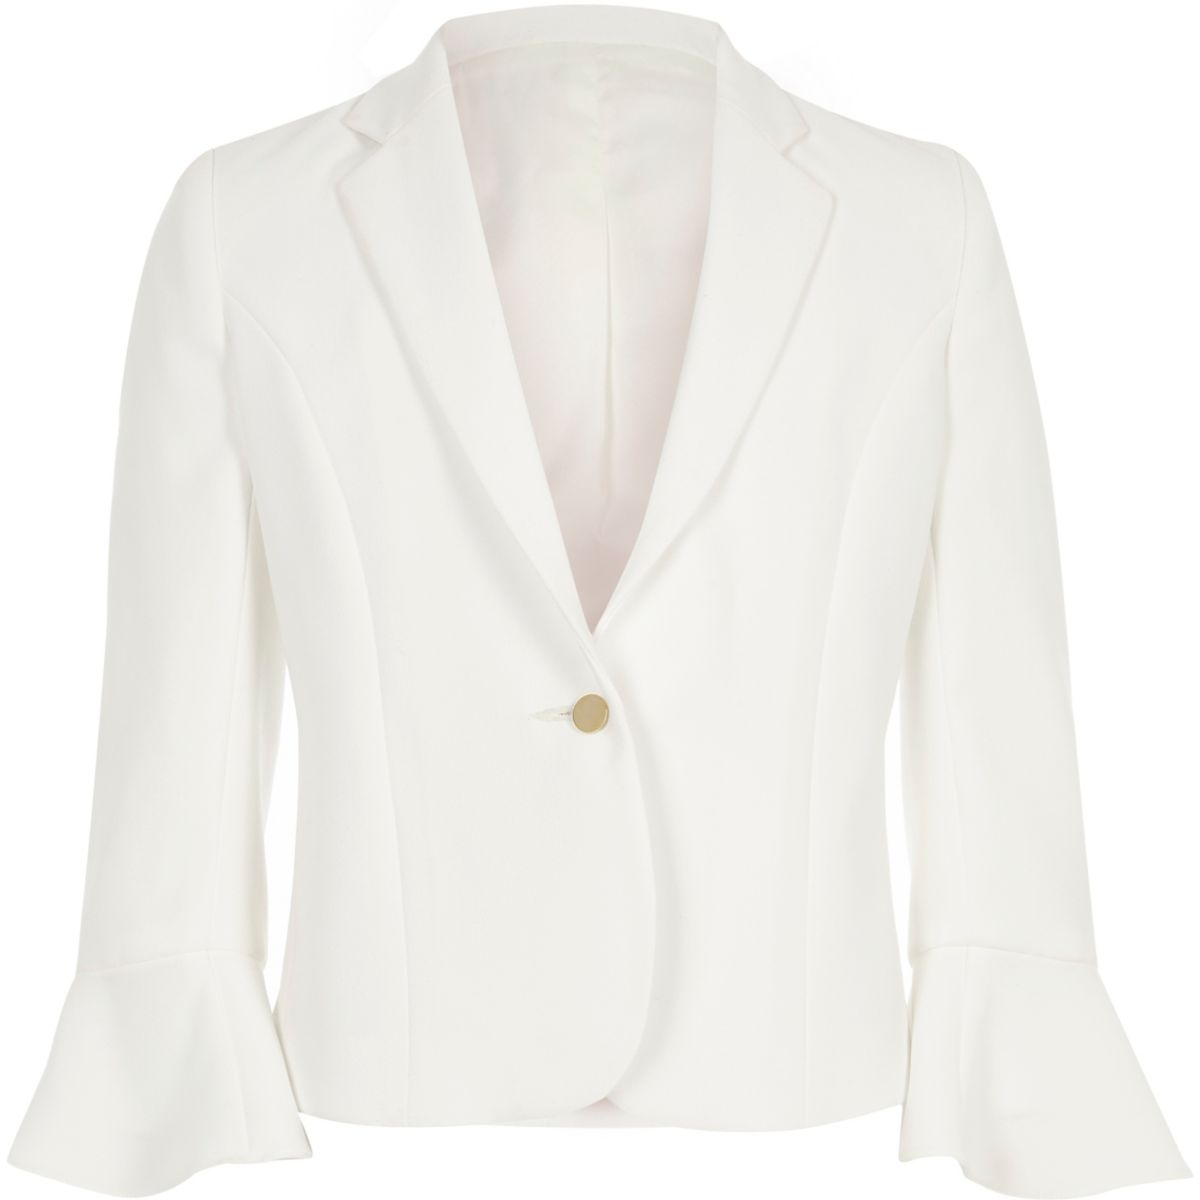 Girls white flute sleeve blazer